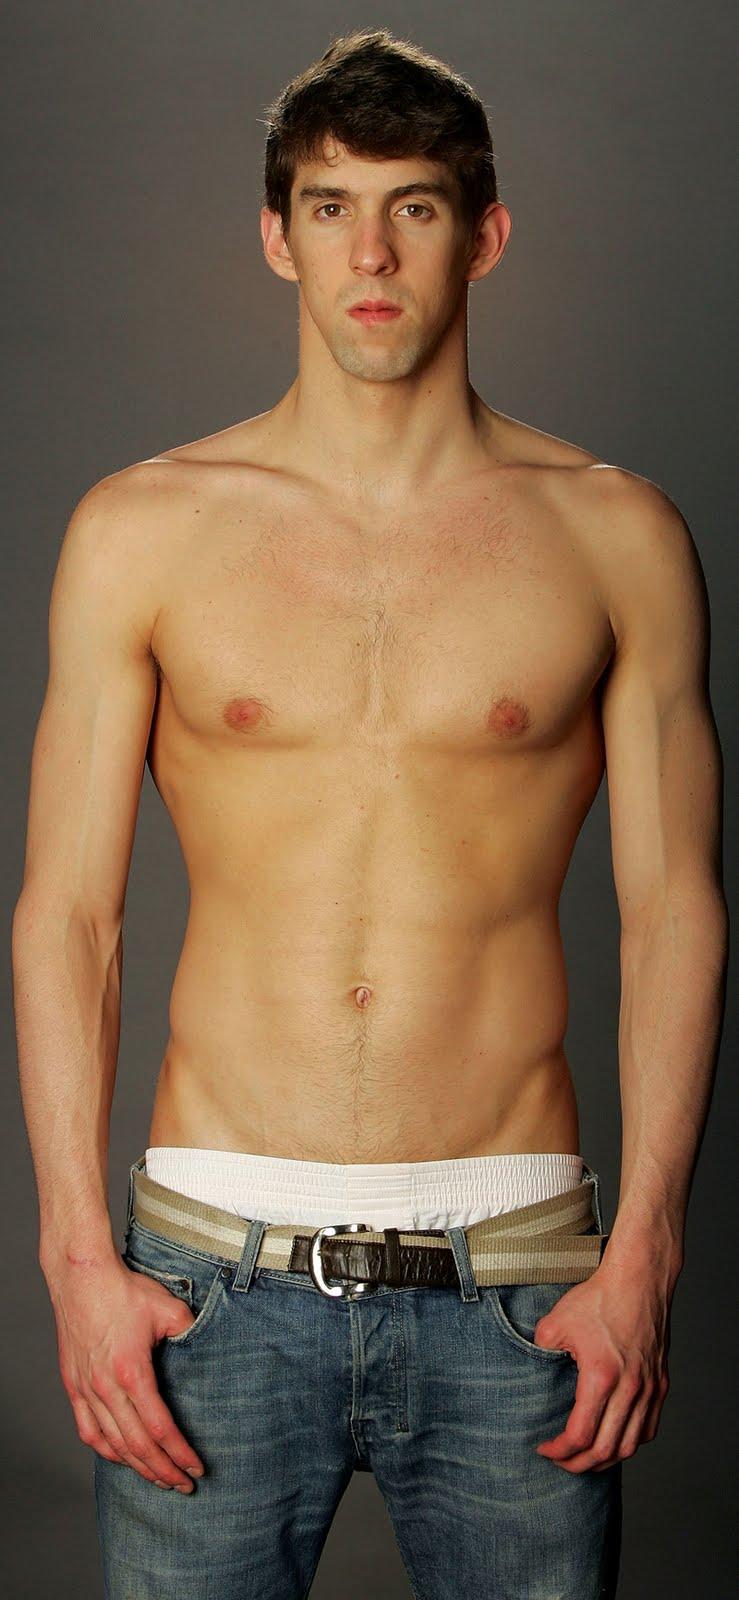 Pro Athletes Go Nude In ESPN Body Issue (NSFW) - CheapUndies